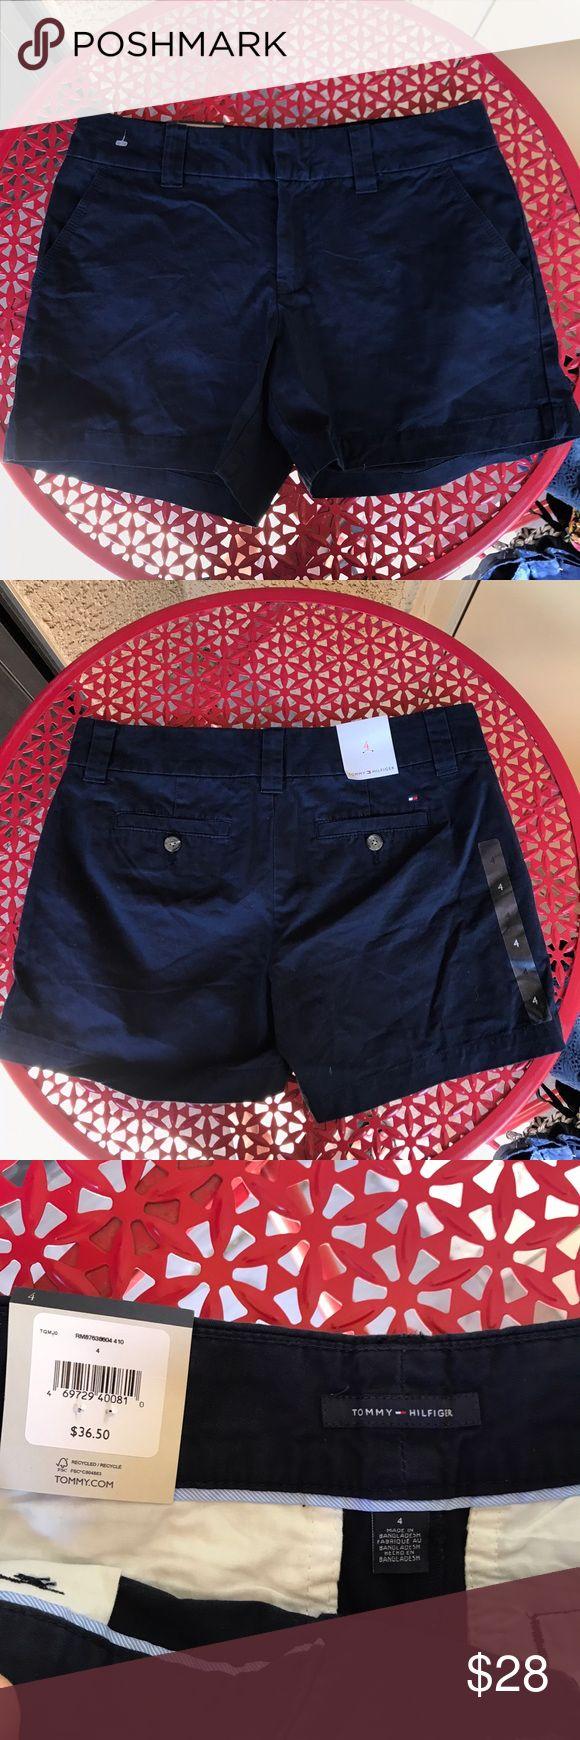 NWT Tommy Hilfiger navy blue chino shorts Brand new with tags. Tommy Hilfiger navy blue Chino style shorts.  Size 4. Chino style shorts. Tommy Hilfiger Shorts